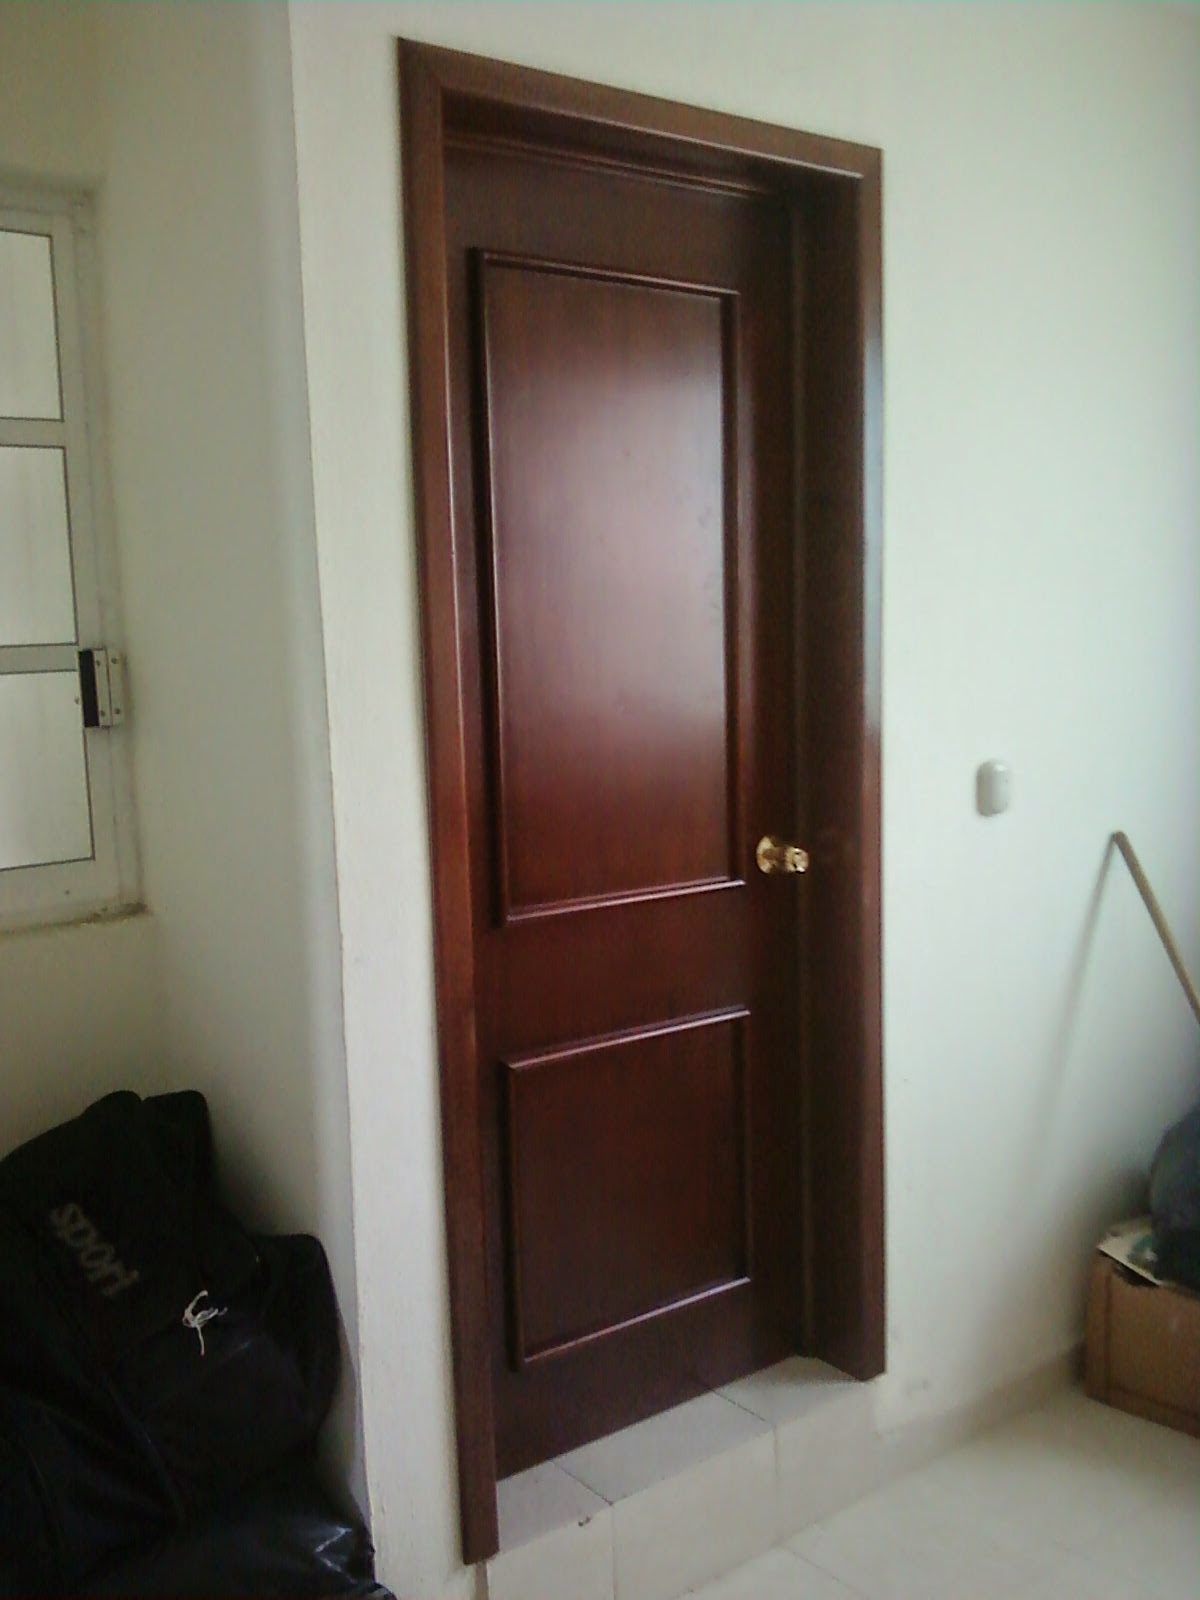 Masterpiece ebanisteria puertas for Puertas vaiven para cocina